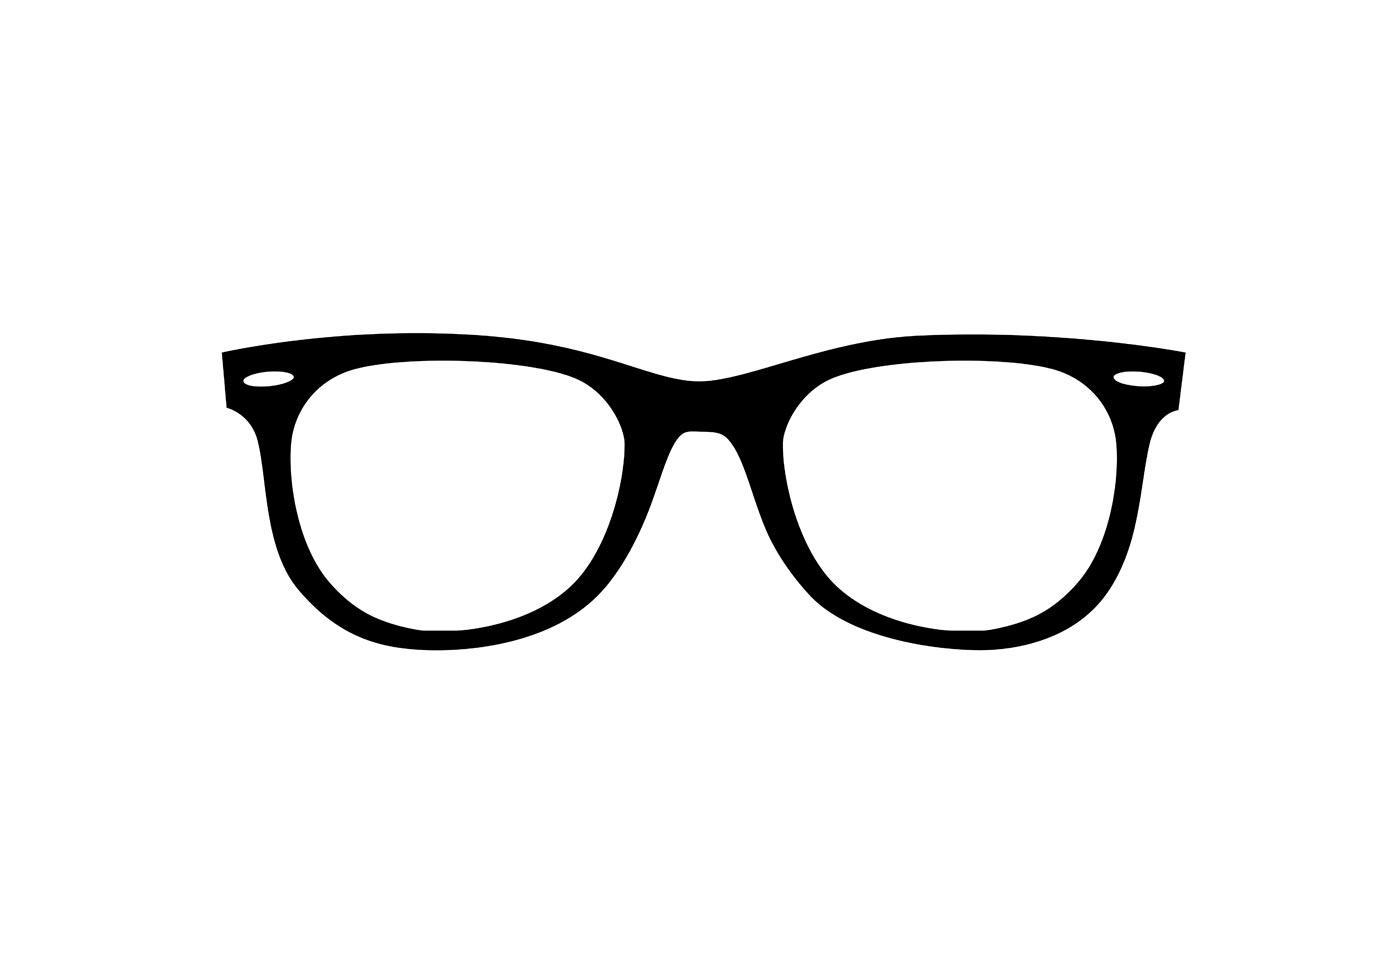 Eyewear Vector - ClipArt Best